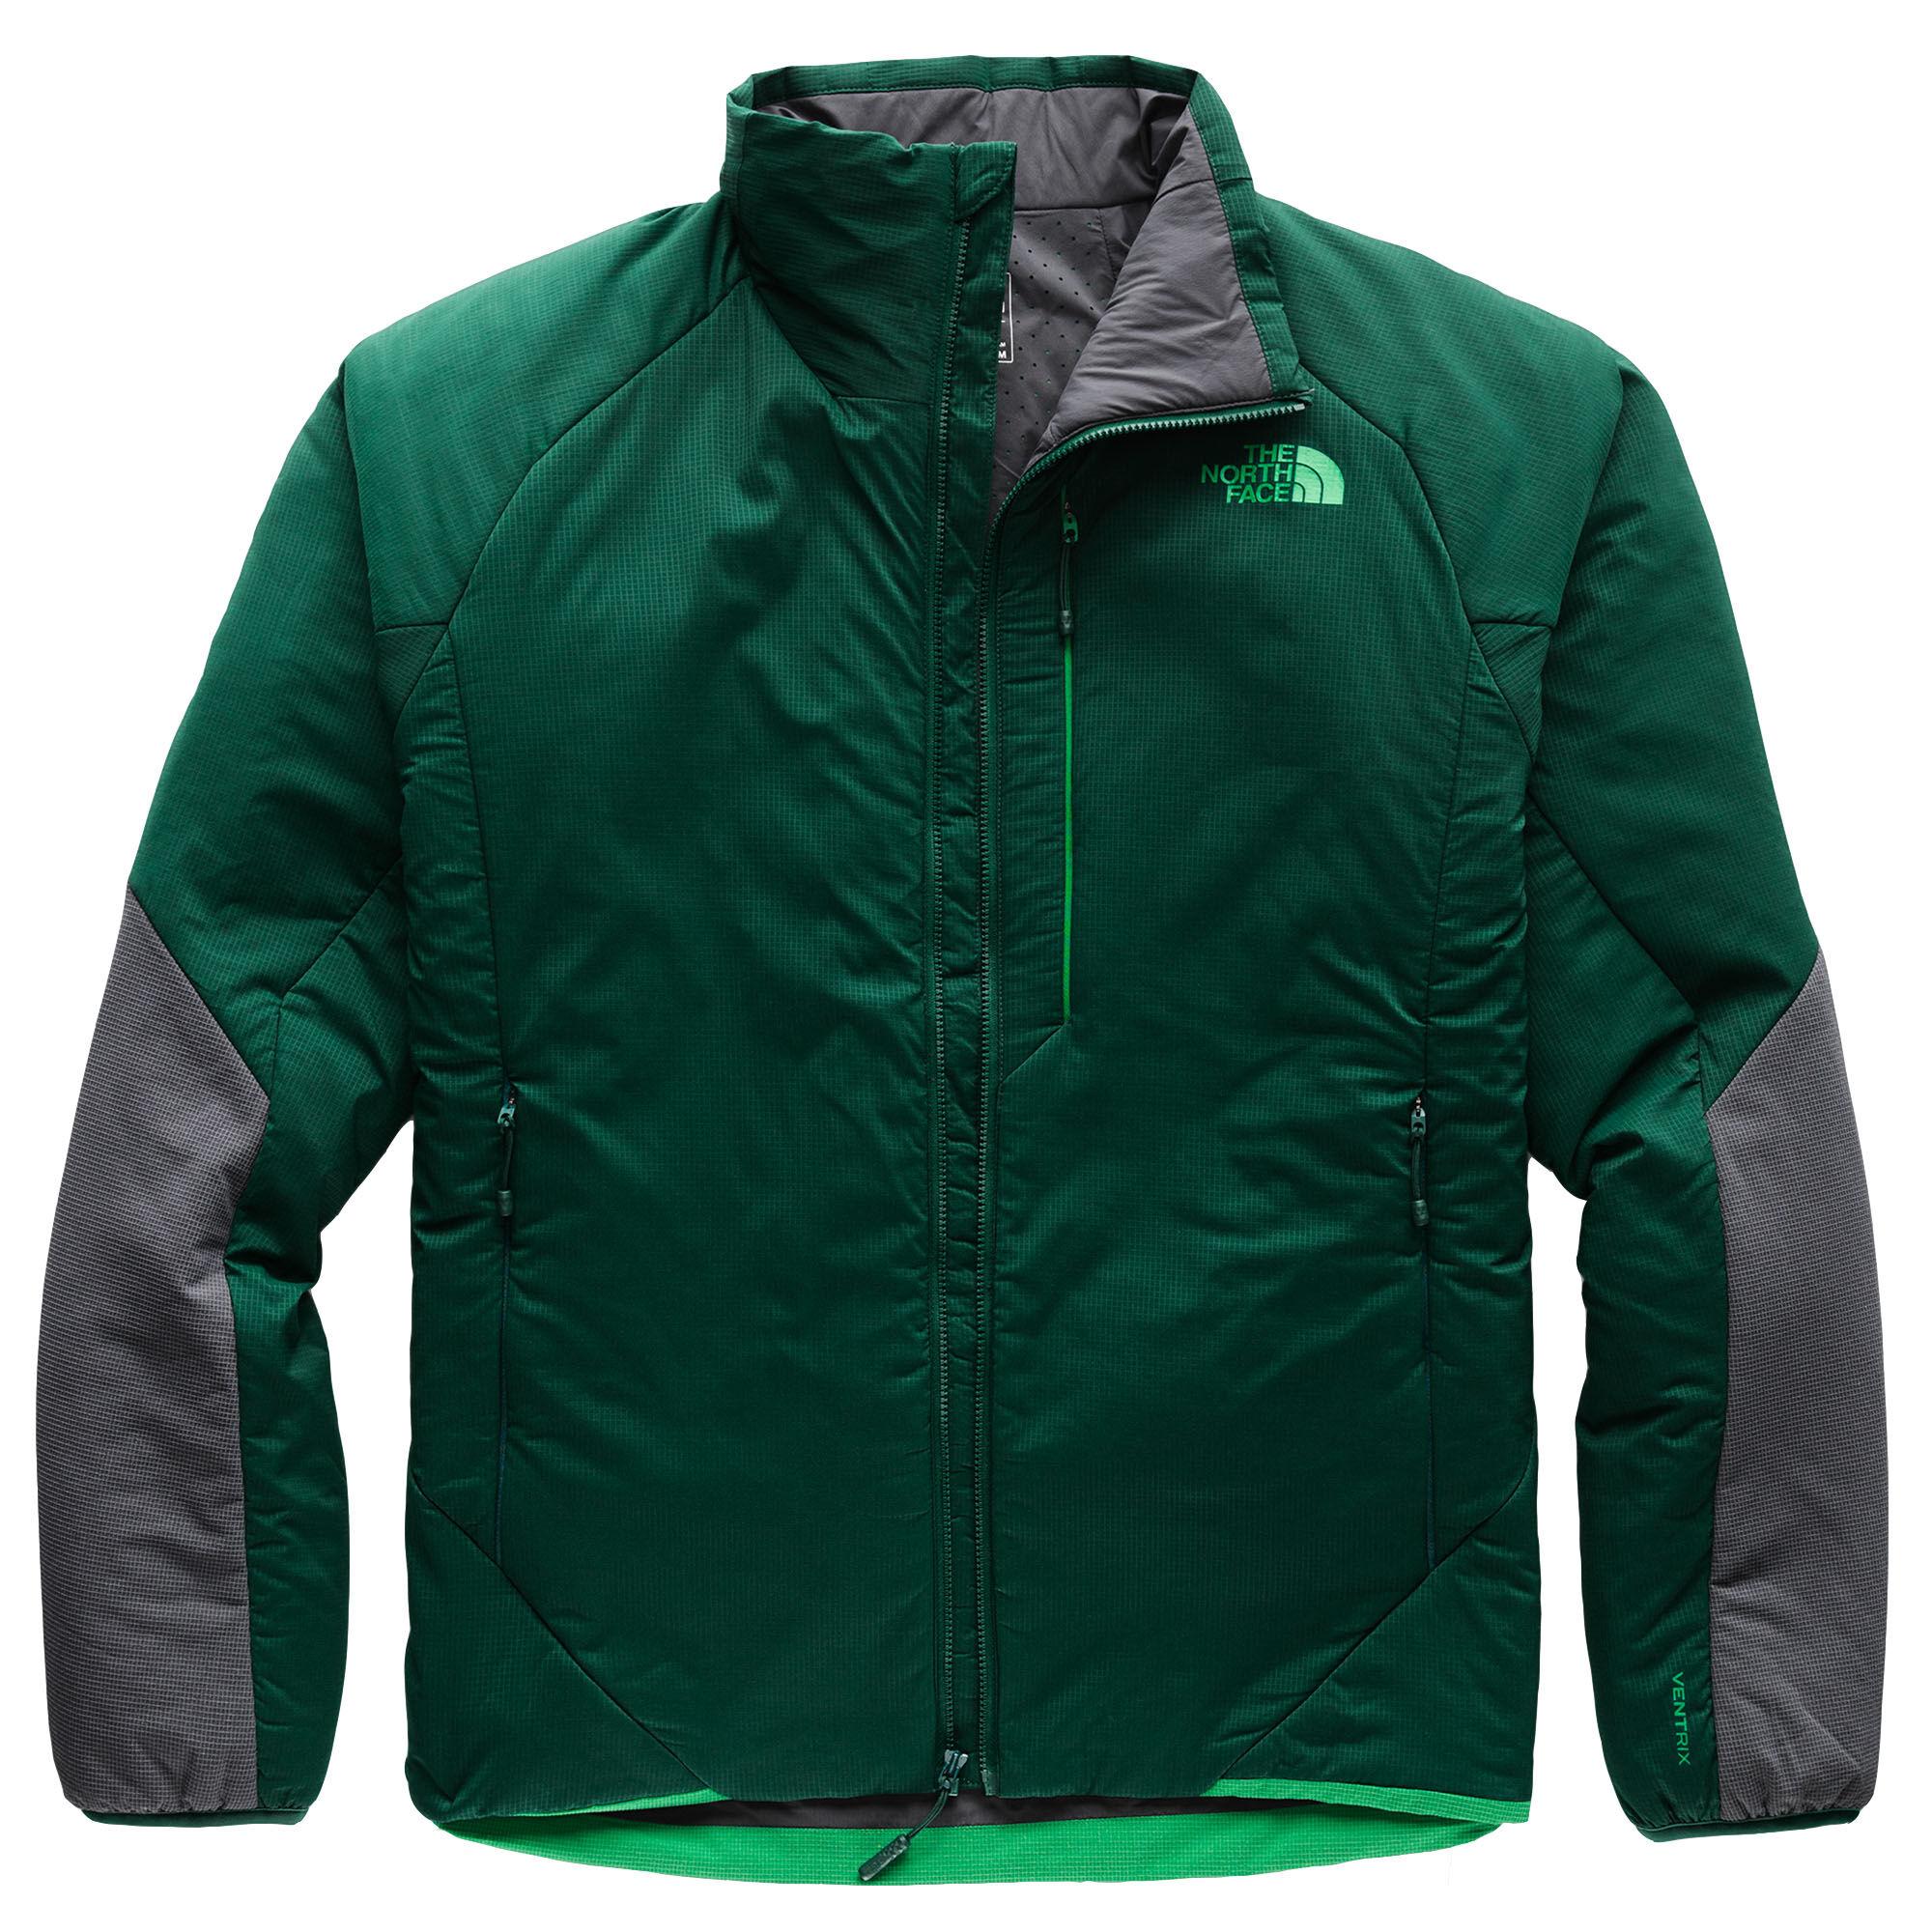 The North Face Men's Ventrix Jacket, Green  - Botanical Garden Green/Vanadis G - Size: Large